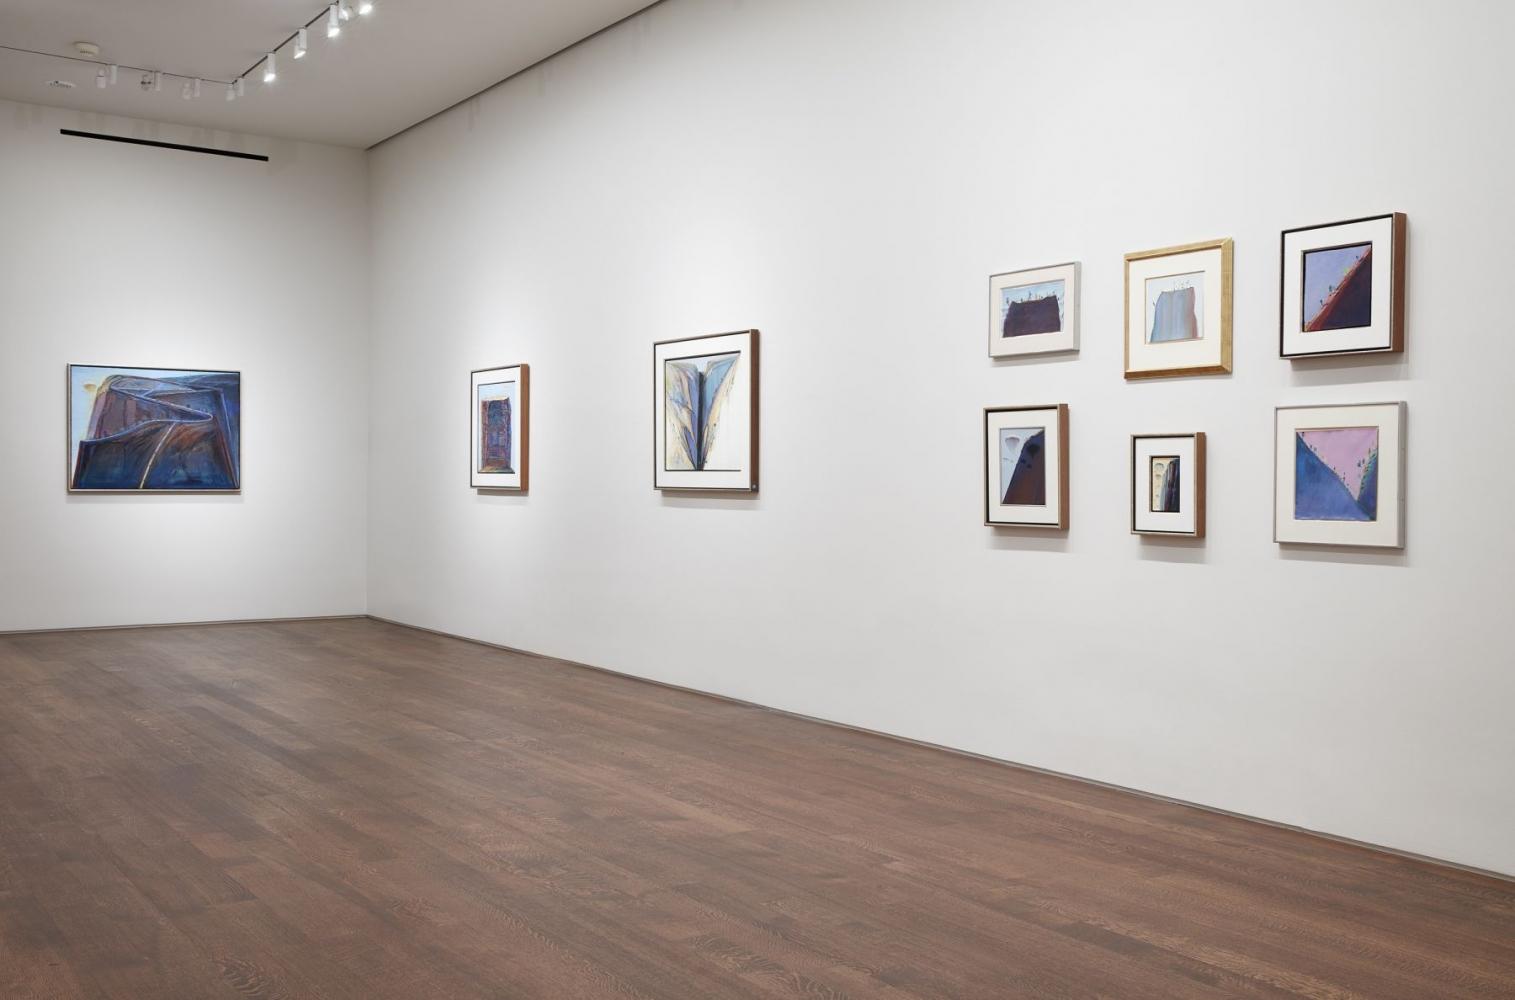 Installation view of Wayne Thiebaud: Mountains, November 5 - December 13, 2019.